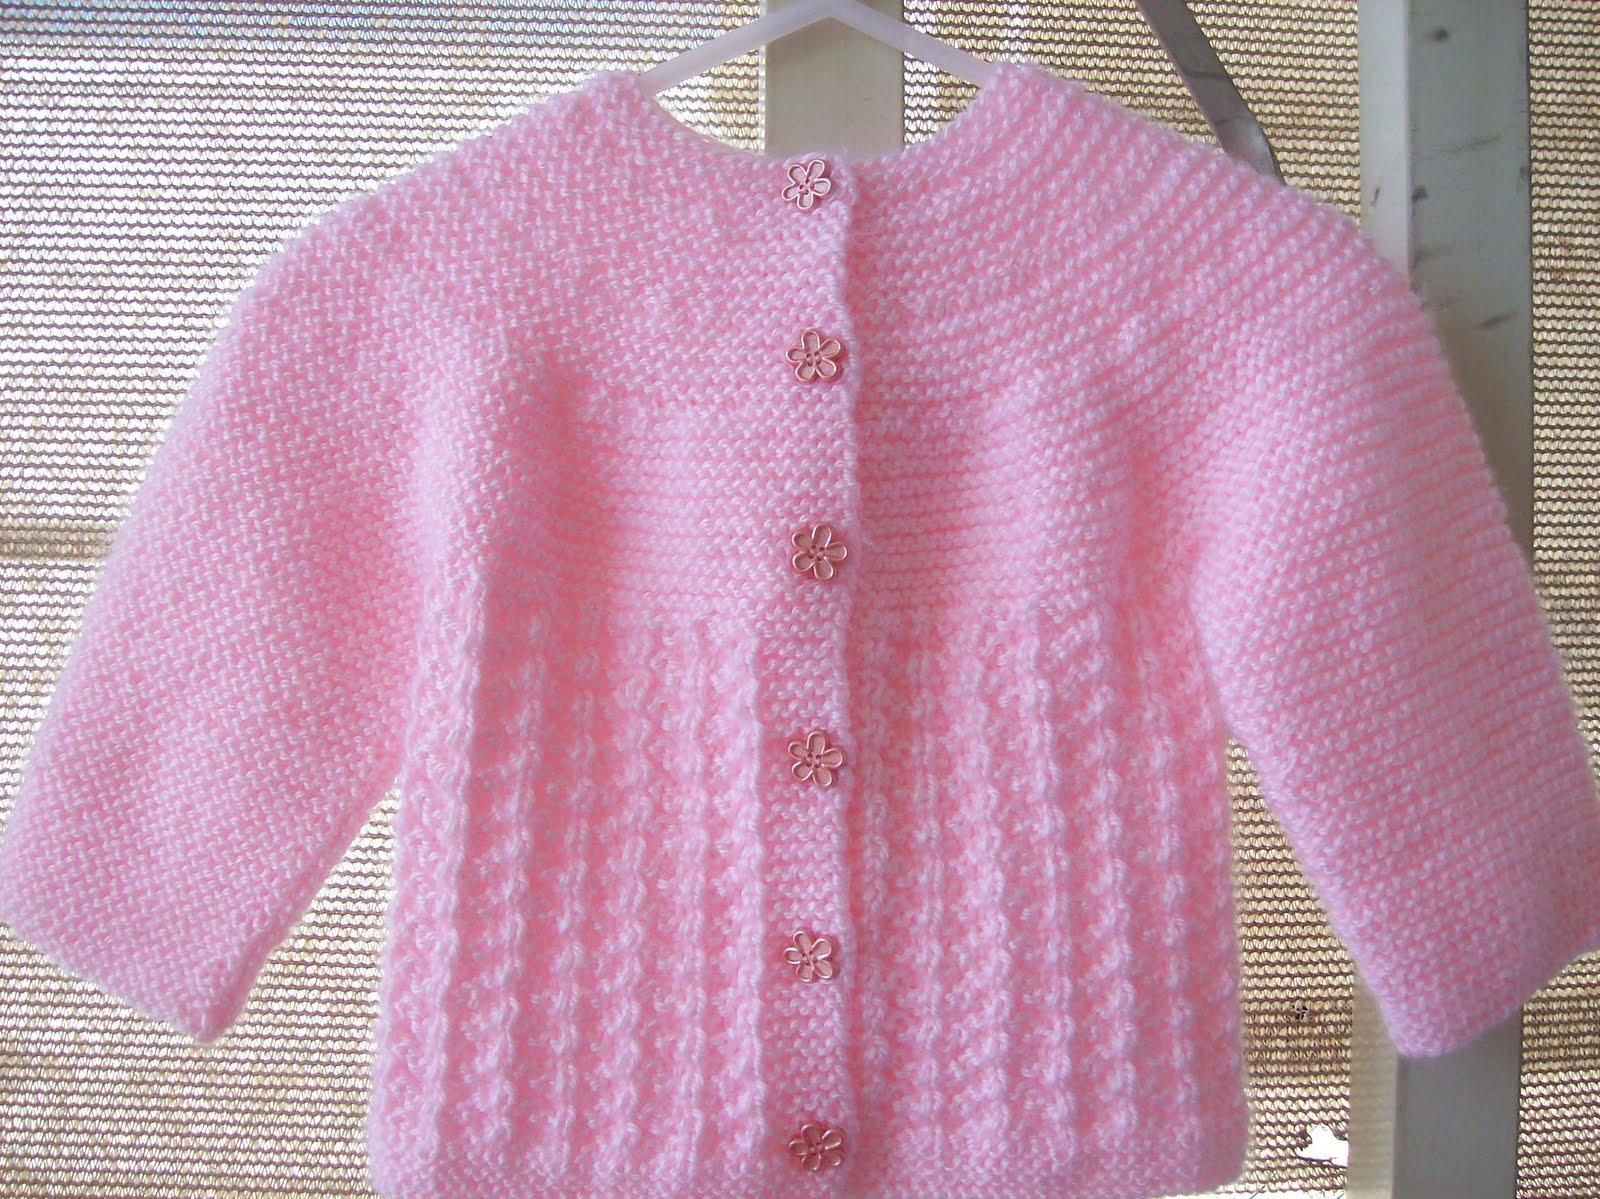 Knitting Sweater Design Images : Nan knits my designs